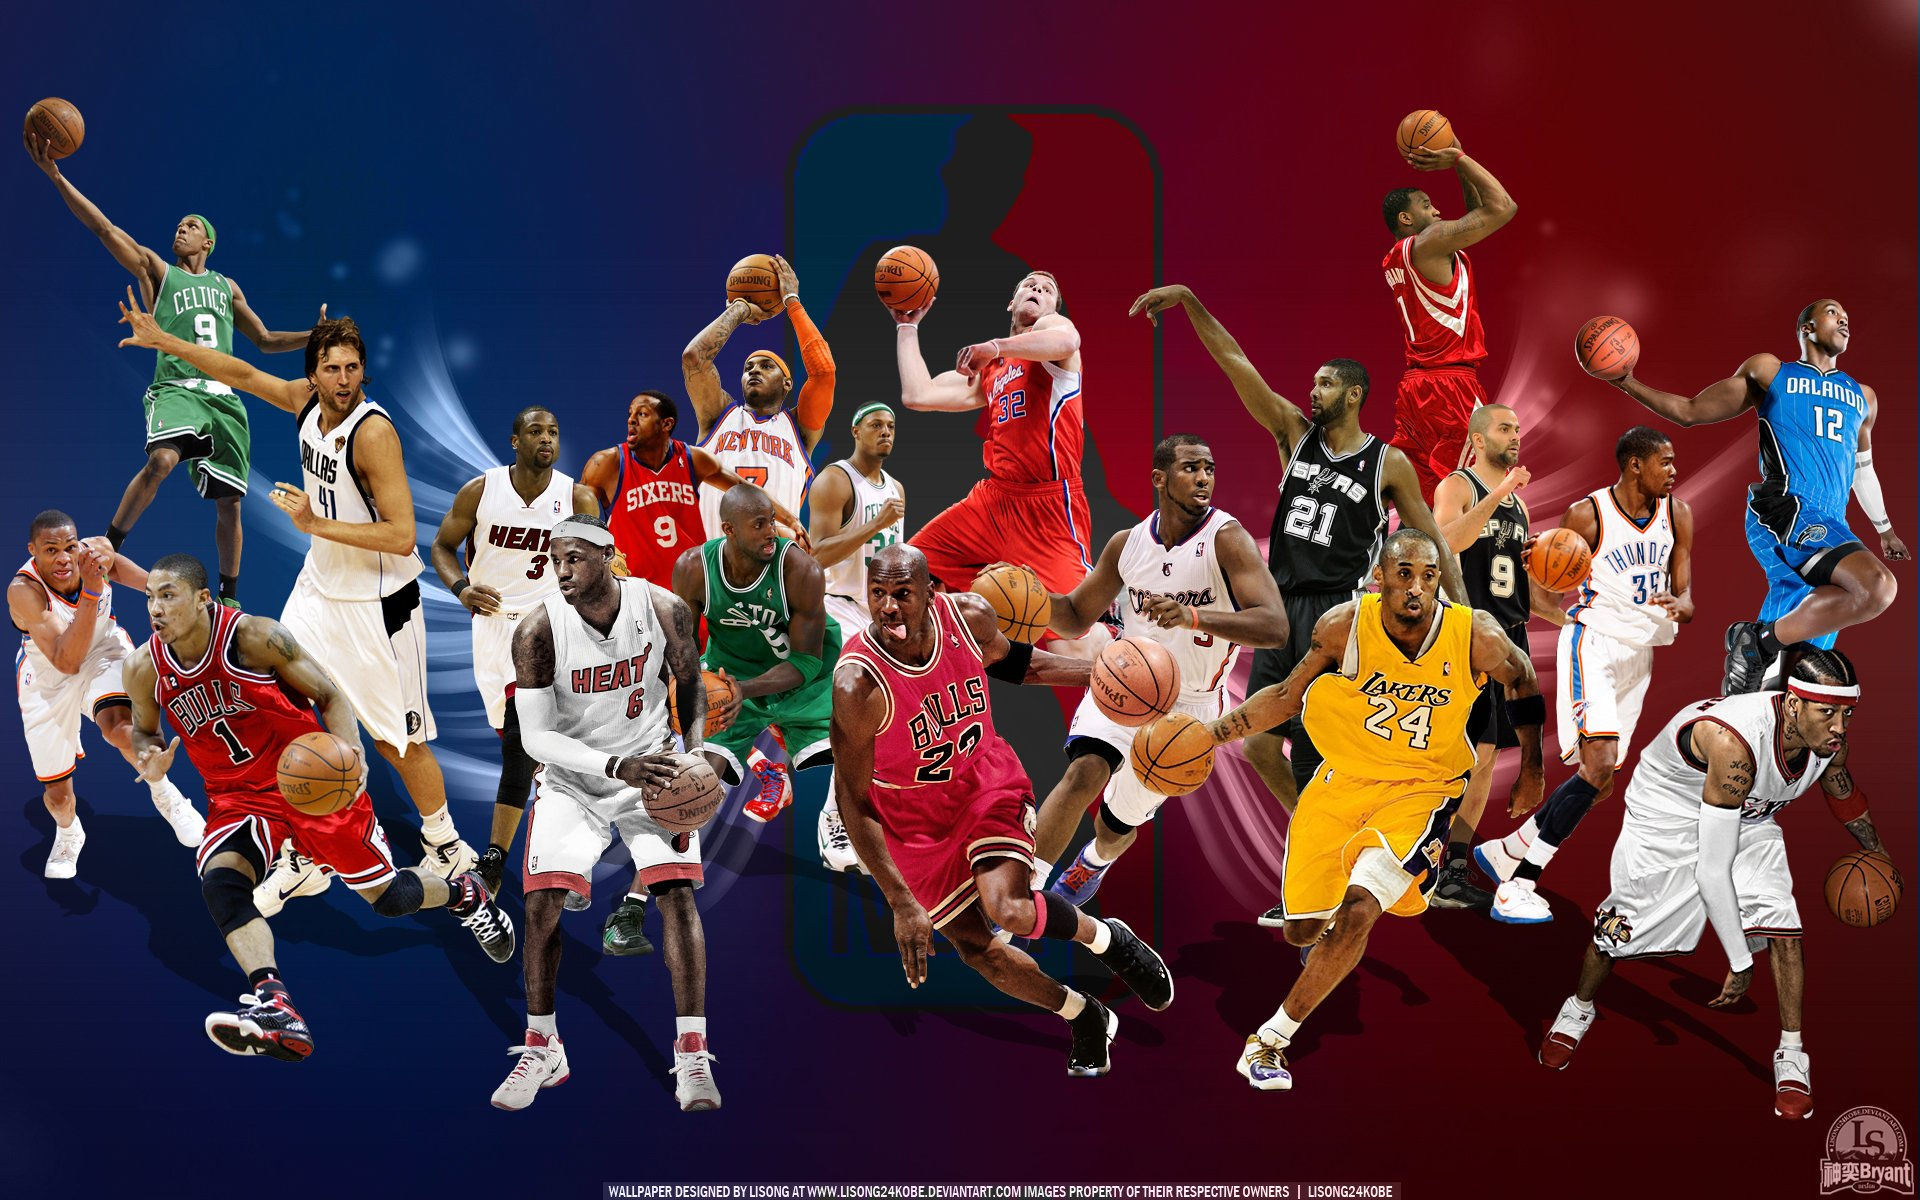 50 Nba Wallpaper Desktop Basketball Wallpapers On Wallpapersafari